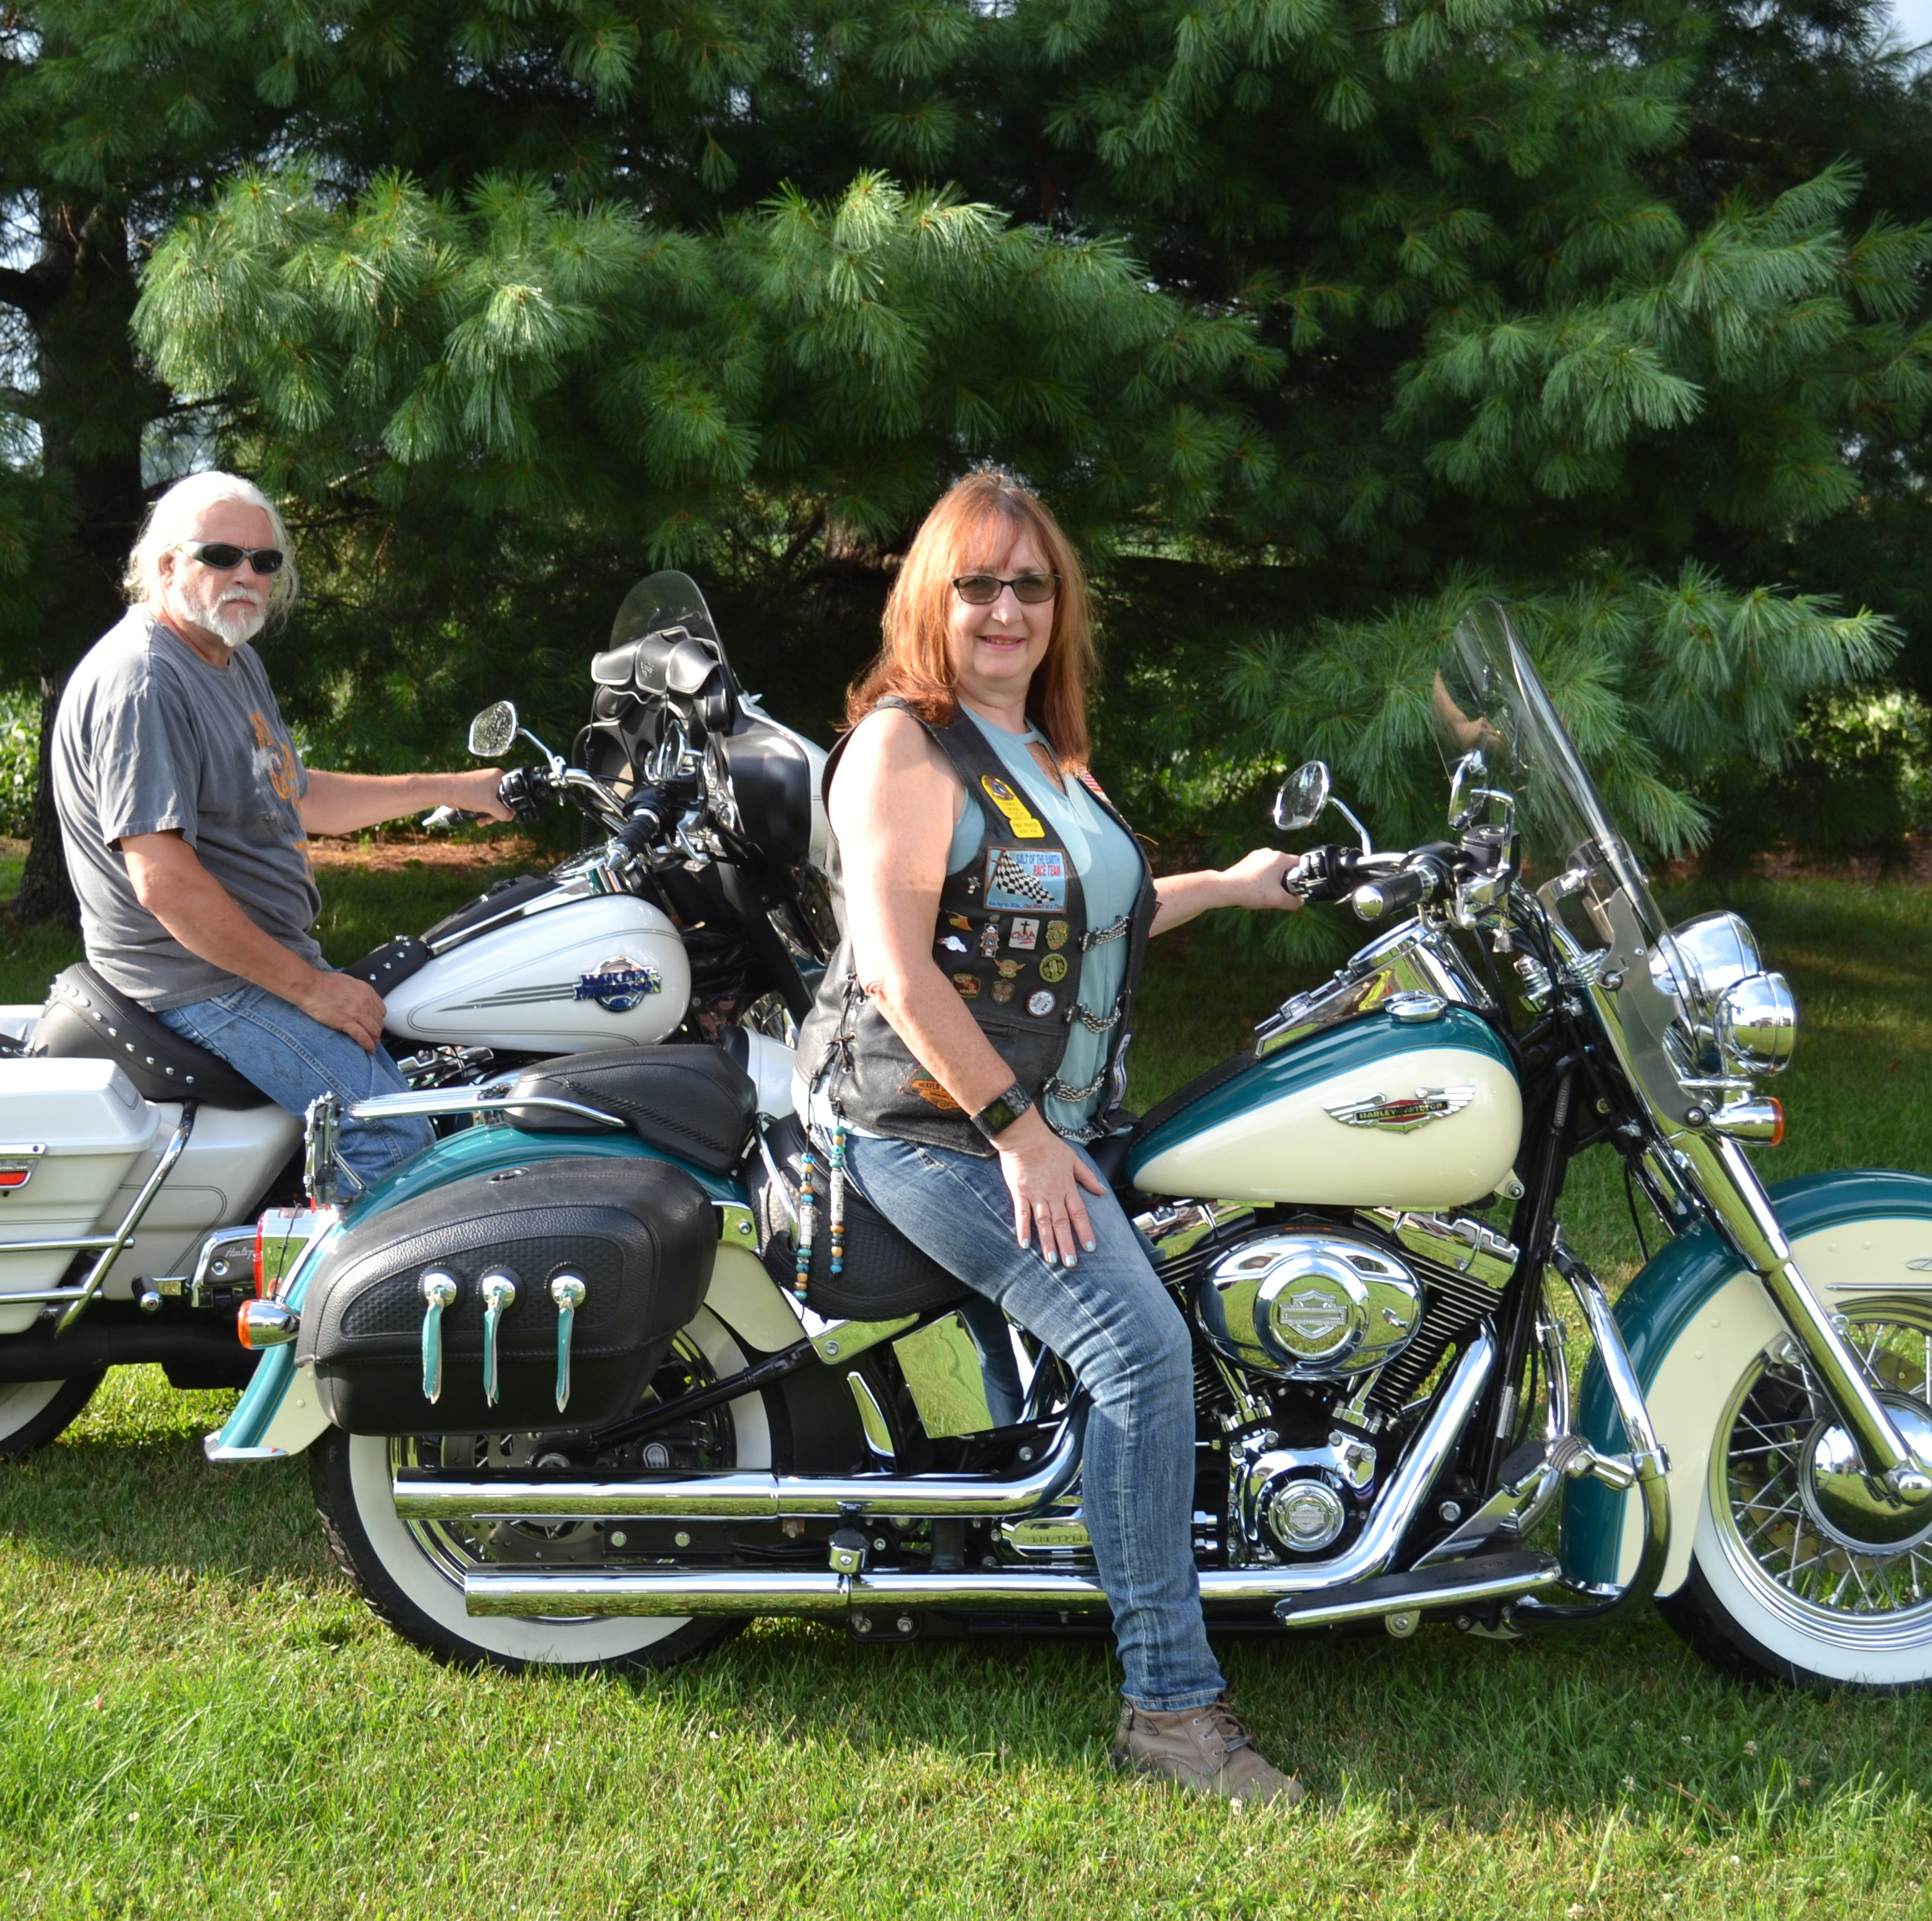 Meet Your Neighbor: Christian bikers, church host anti-drug abuse event